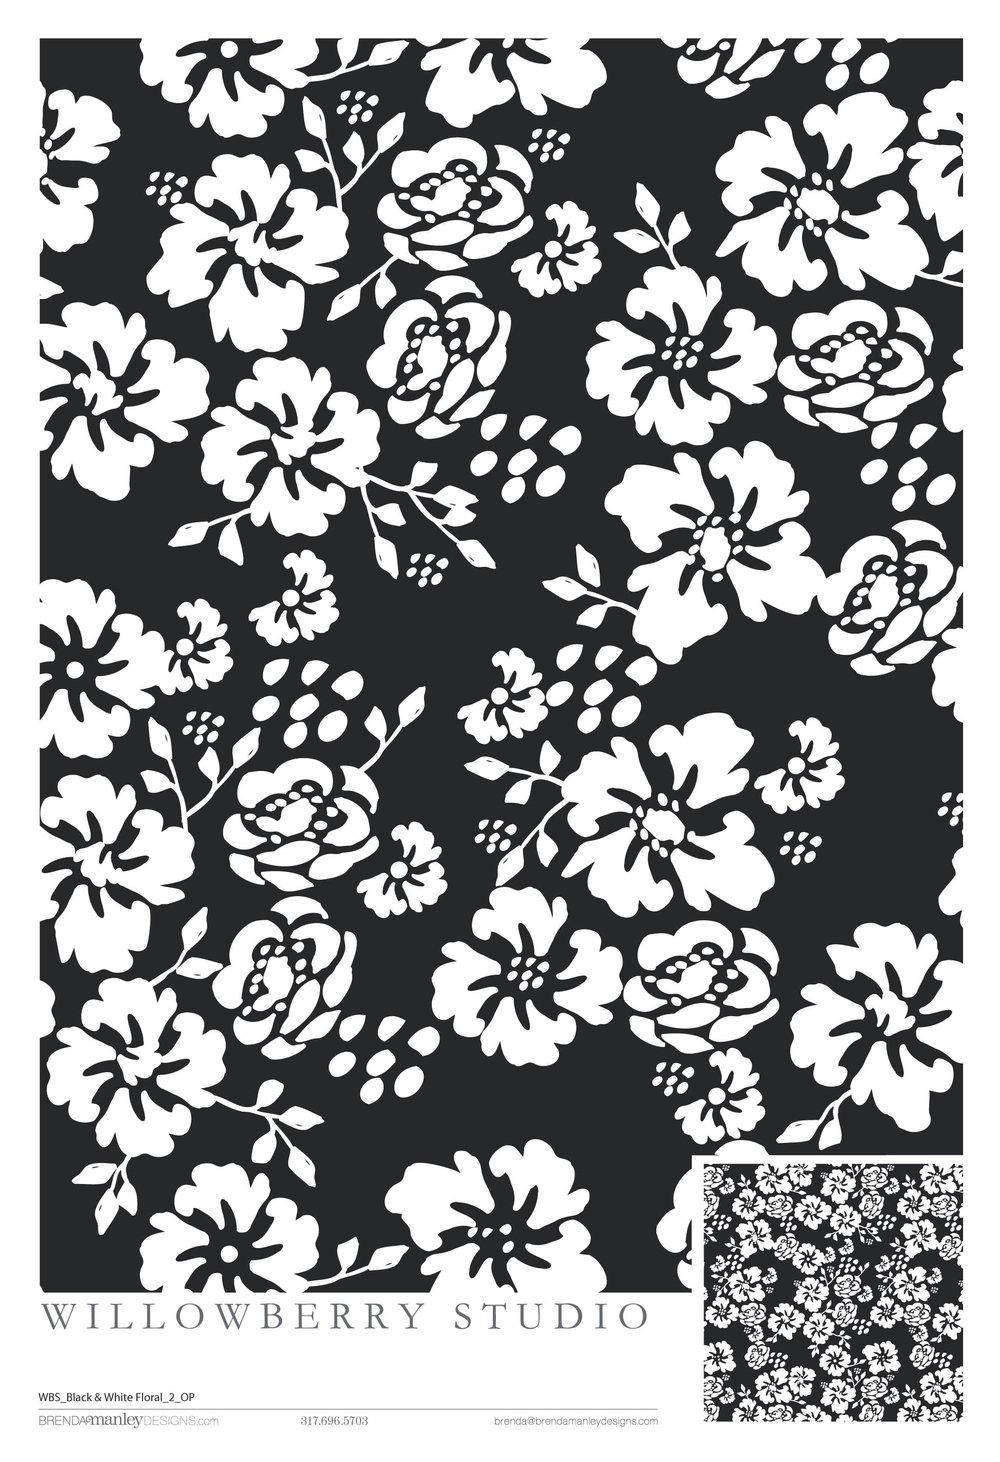 WBS_Black & White Floral_2_OP.jpg